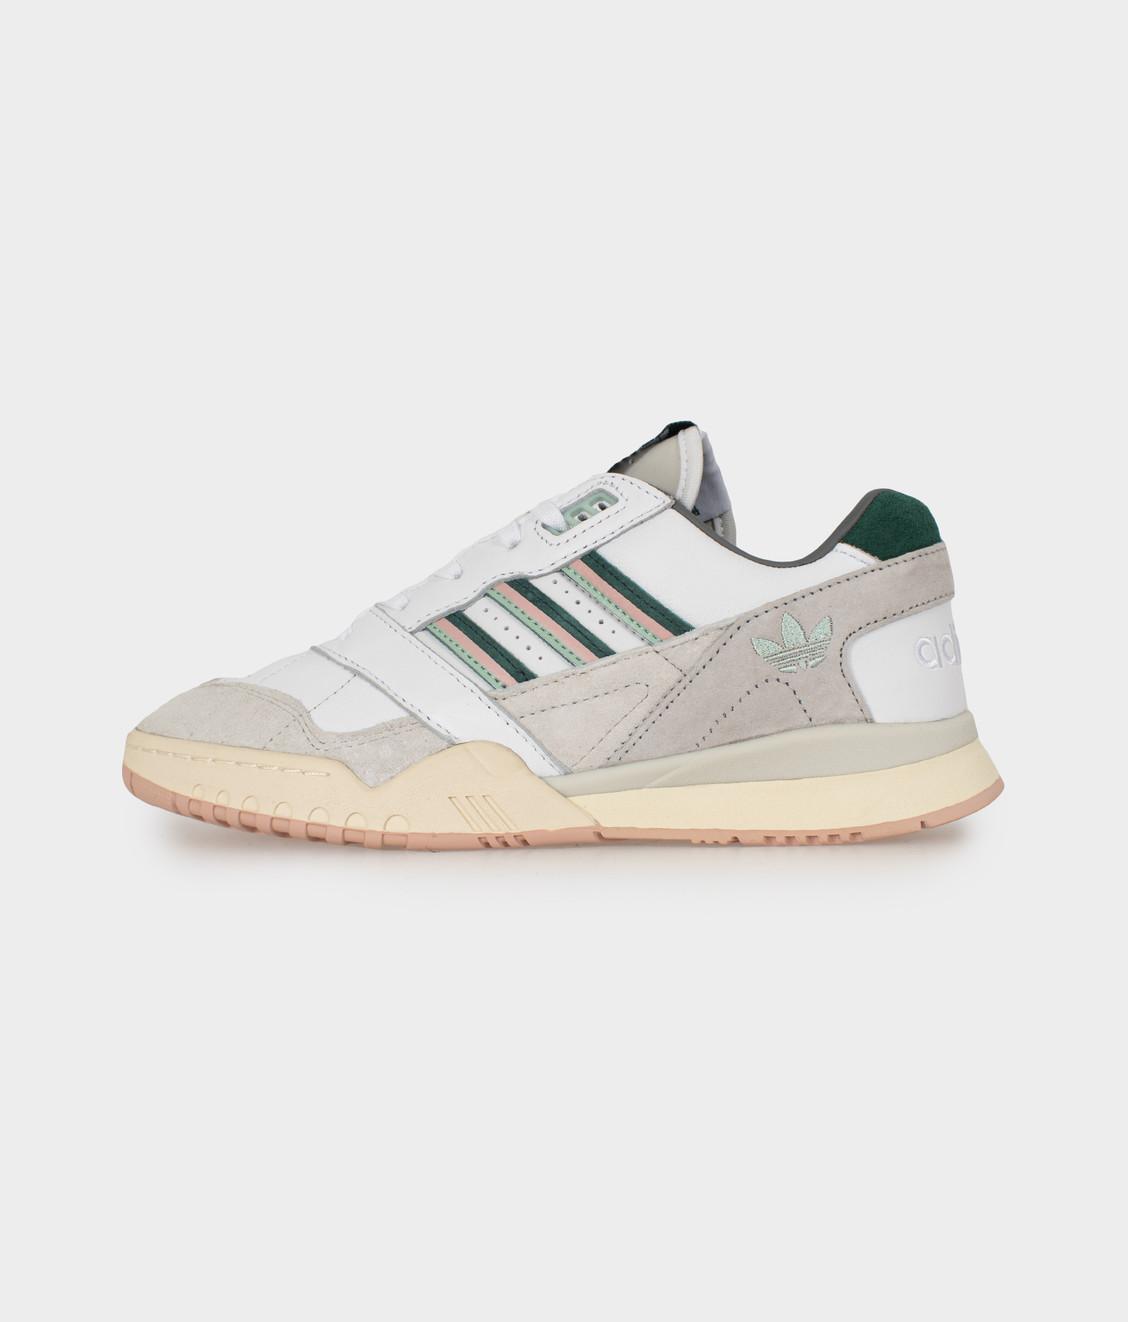 Adidas Adidas A.R Trainer White/Green/Pink